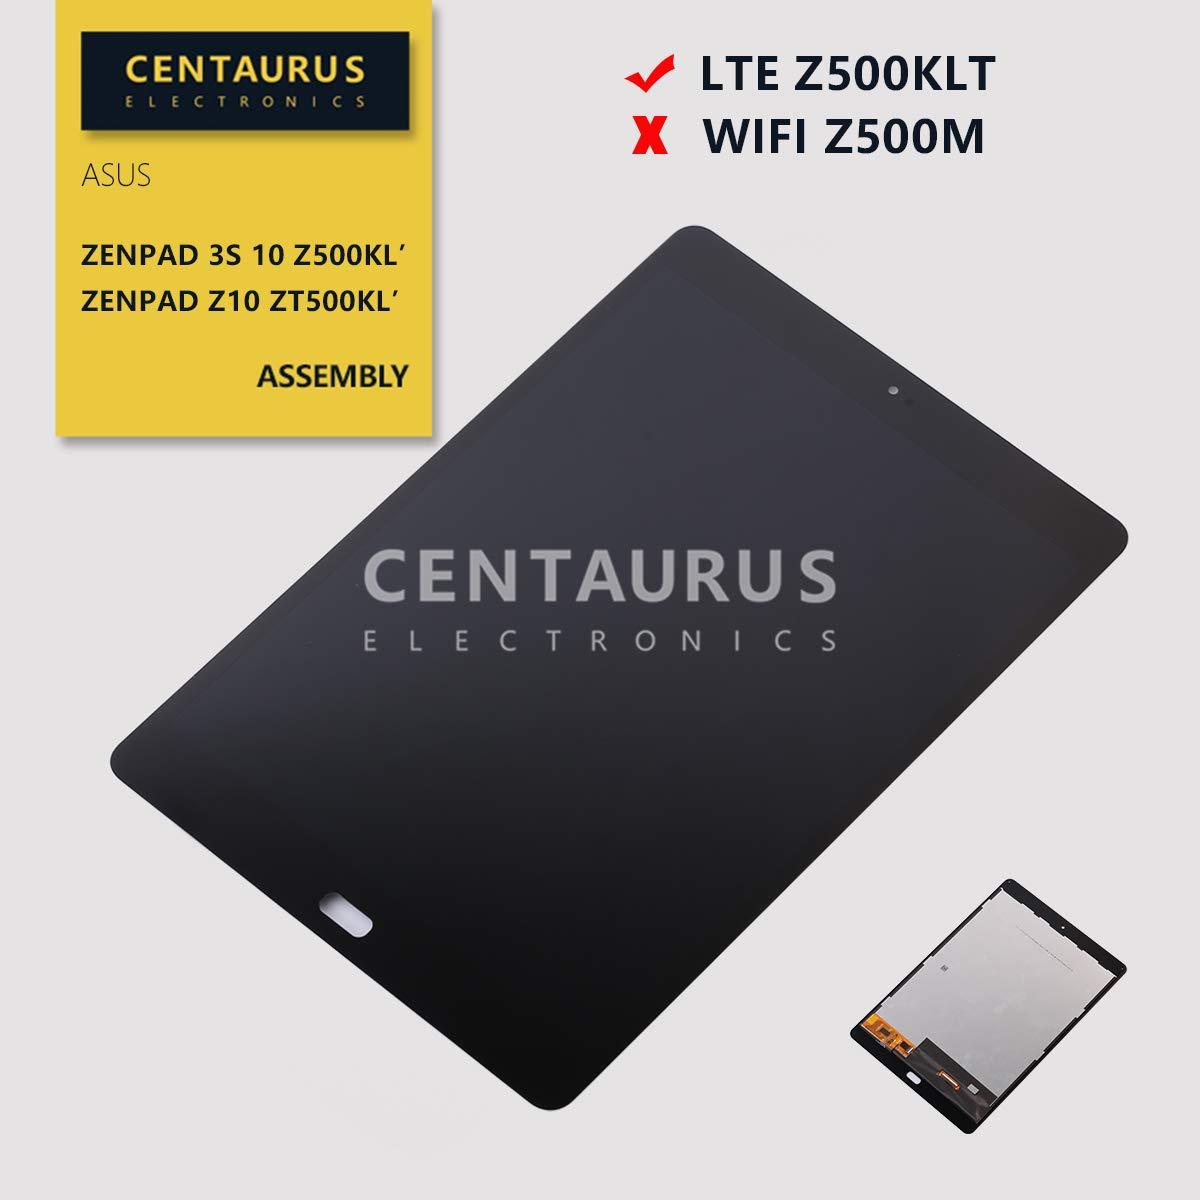 CENTAURUS Assembly Fit Asus Z500KL, Replacement LCD Display Touch Screen Digitizer Compatible Asus ZenPad 3S 10 LTE Z500KL P001 / ZenPad Z10 ZT500KL 9.7 inch (Black)